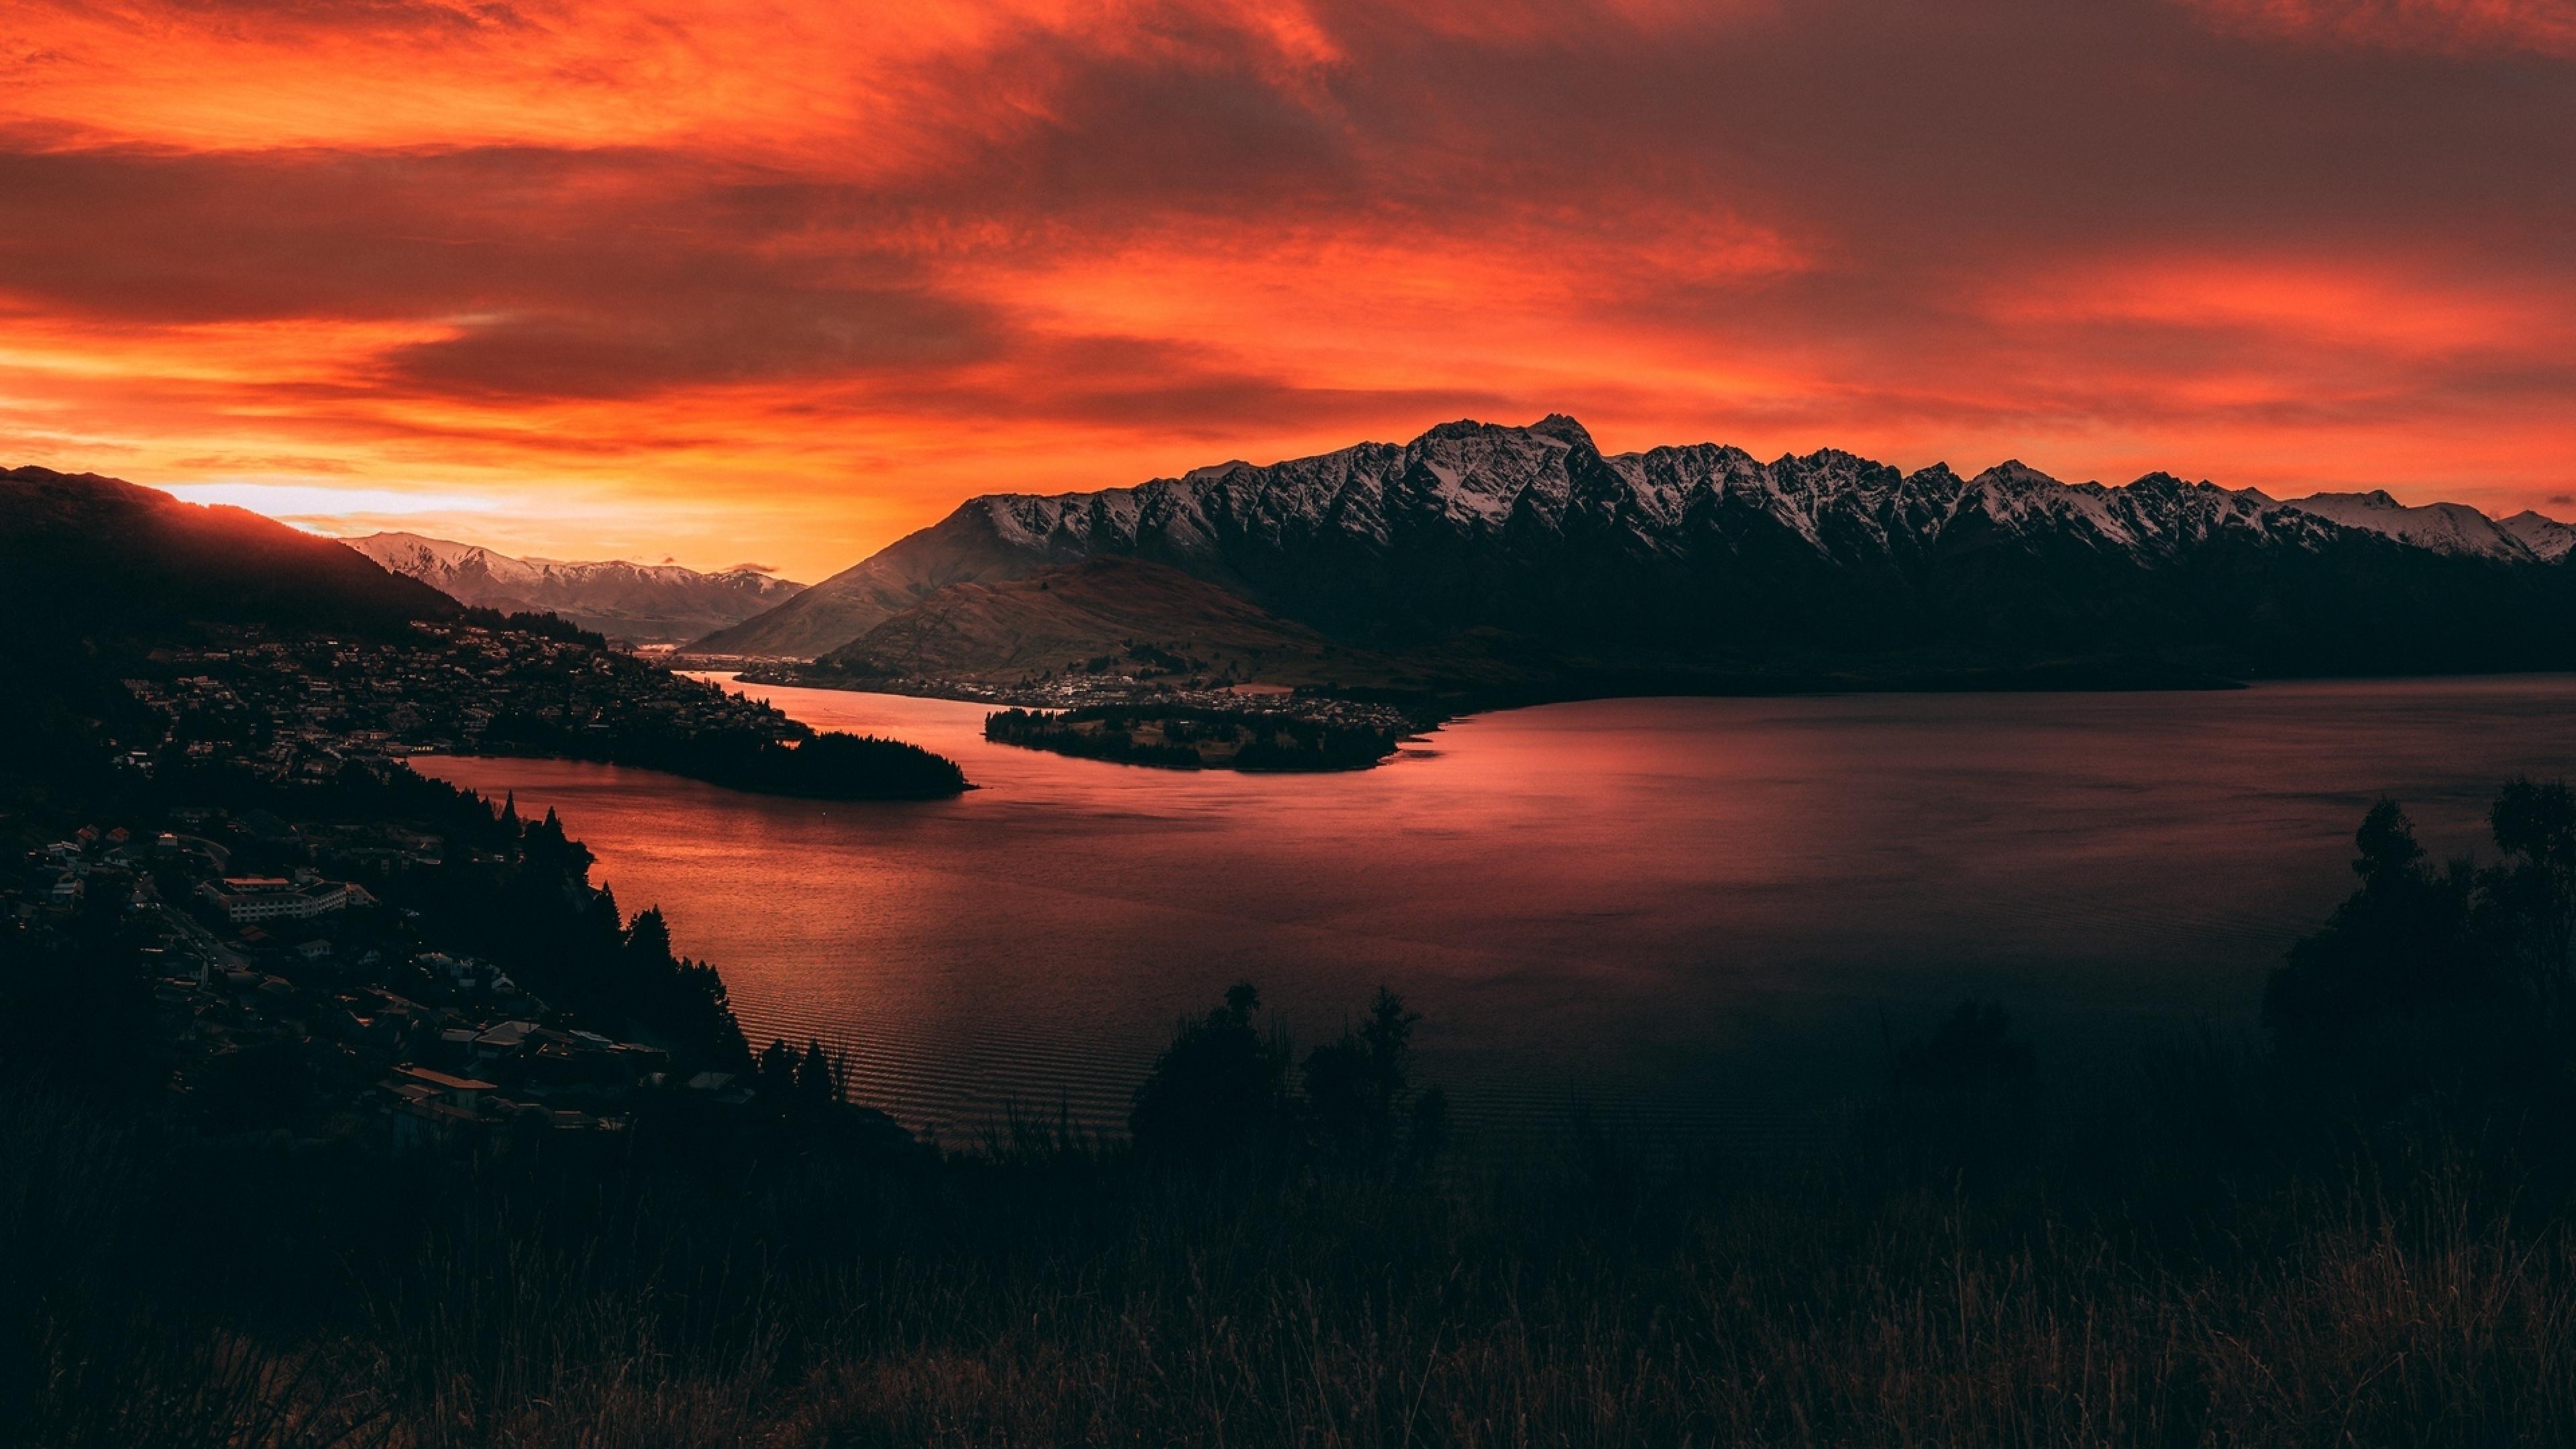 3840x2160 New Zealand Orange Mountain Sunset 4K Wallpaper ...